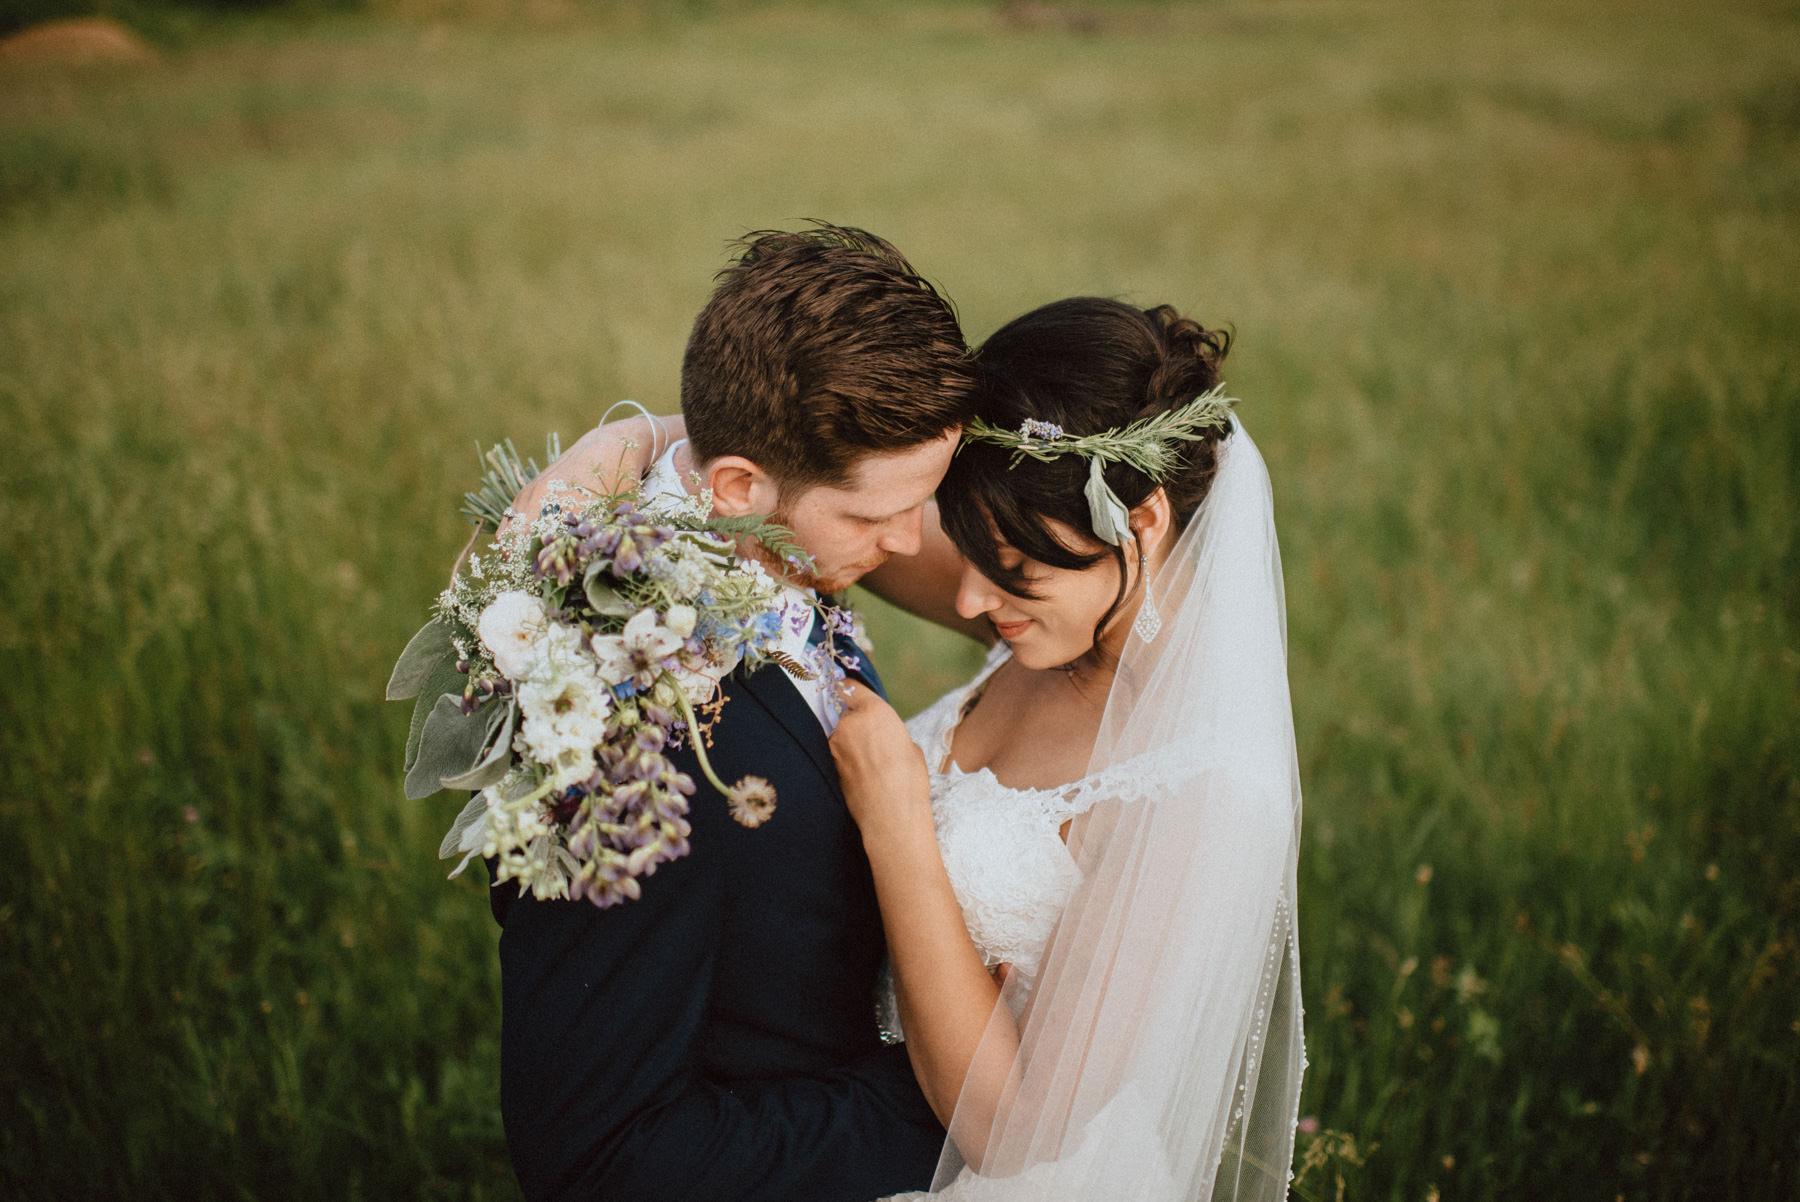 023-milburn-orchards-wedding-6.jpg